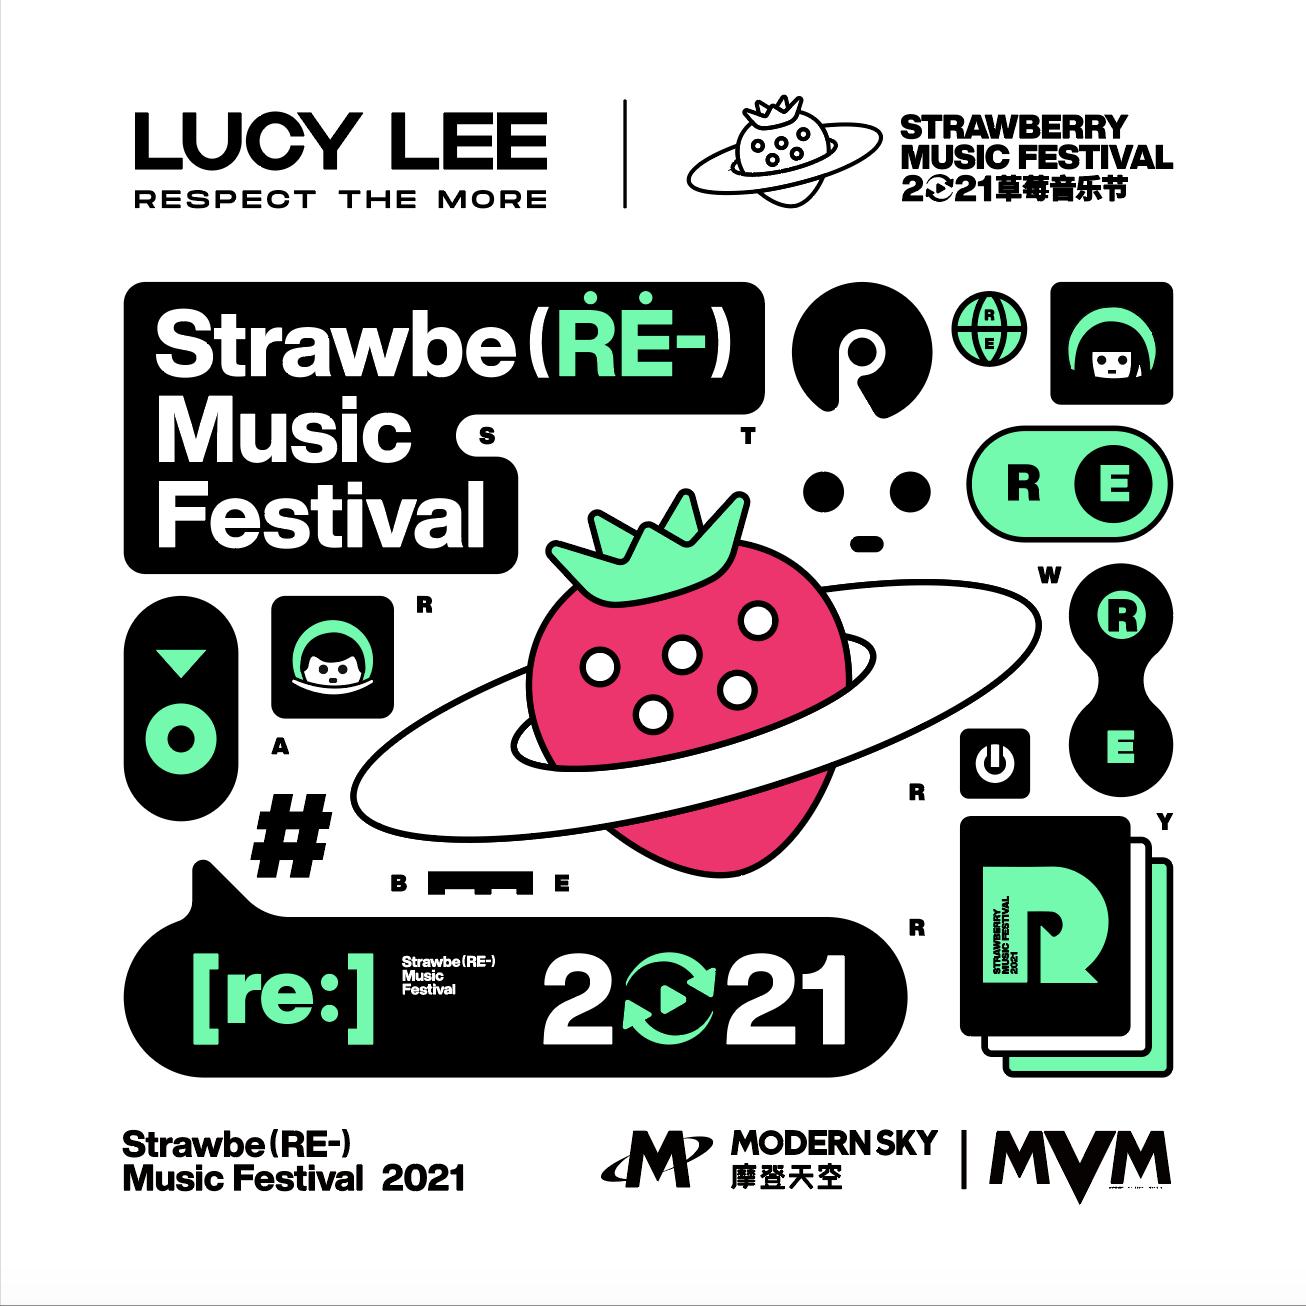 LUCY LEE×草莓音乐节 见证假发与音乐的完美融合